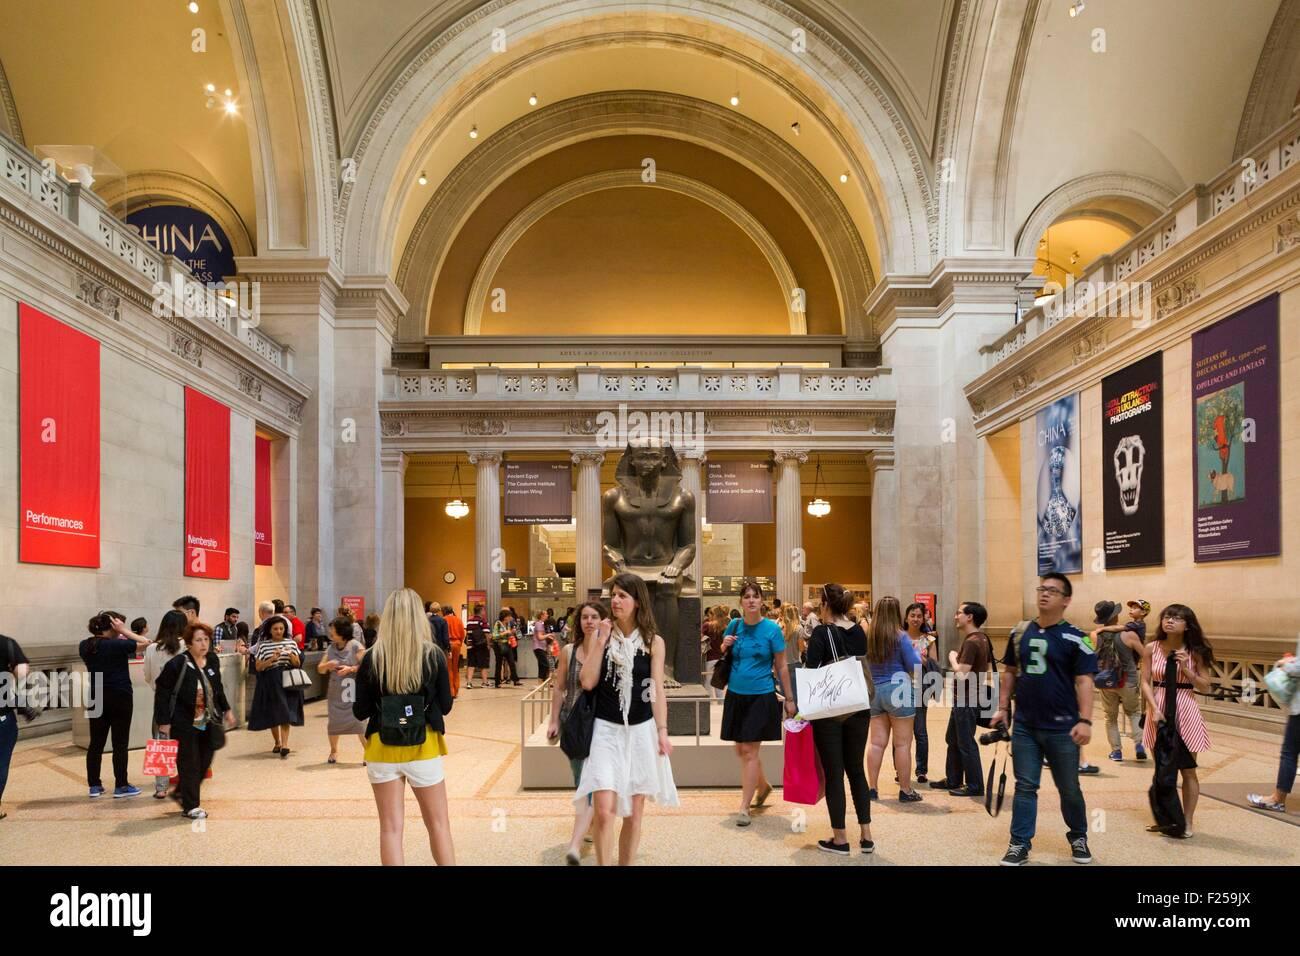 United States, New York, Manhattan, MET, the lobby - Stock Image